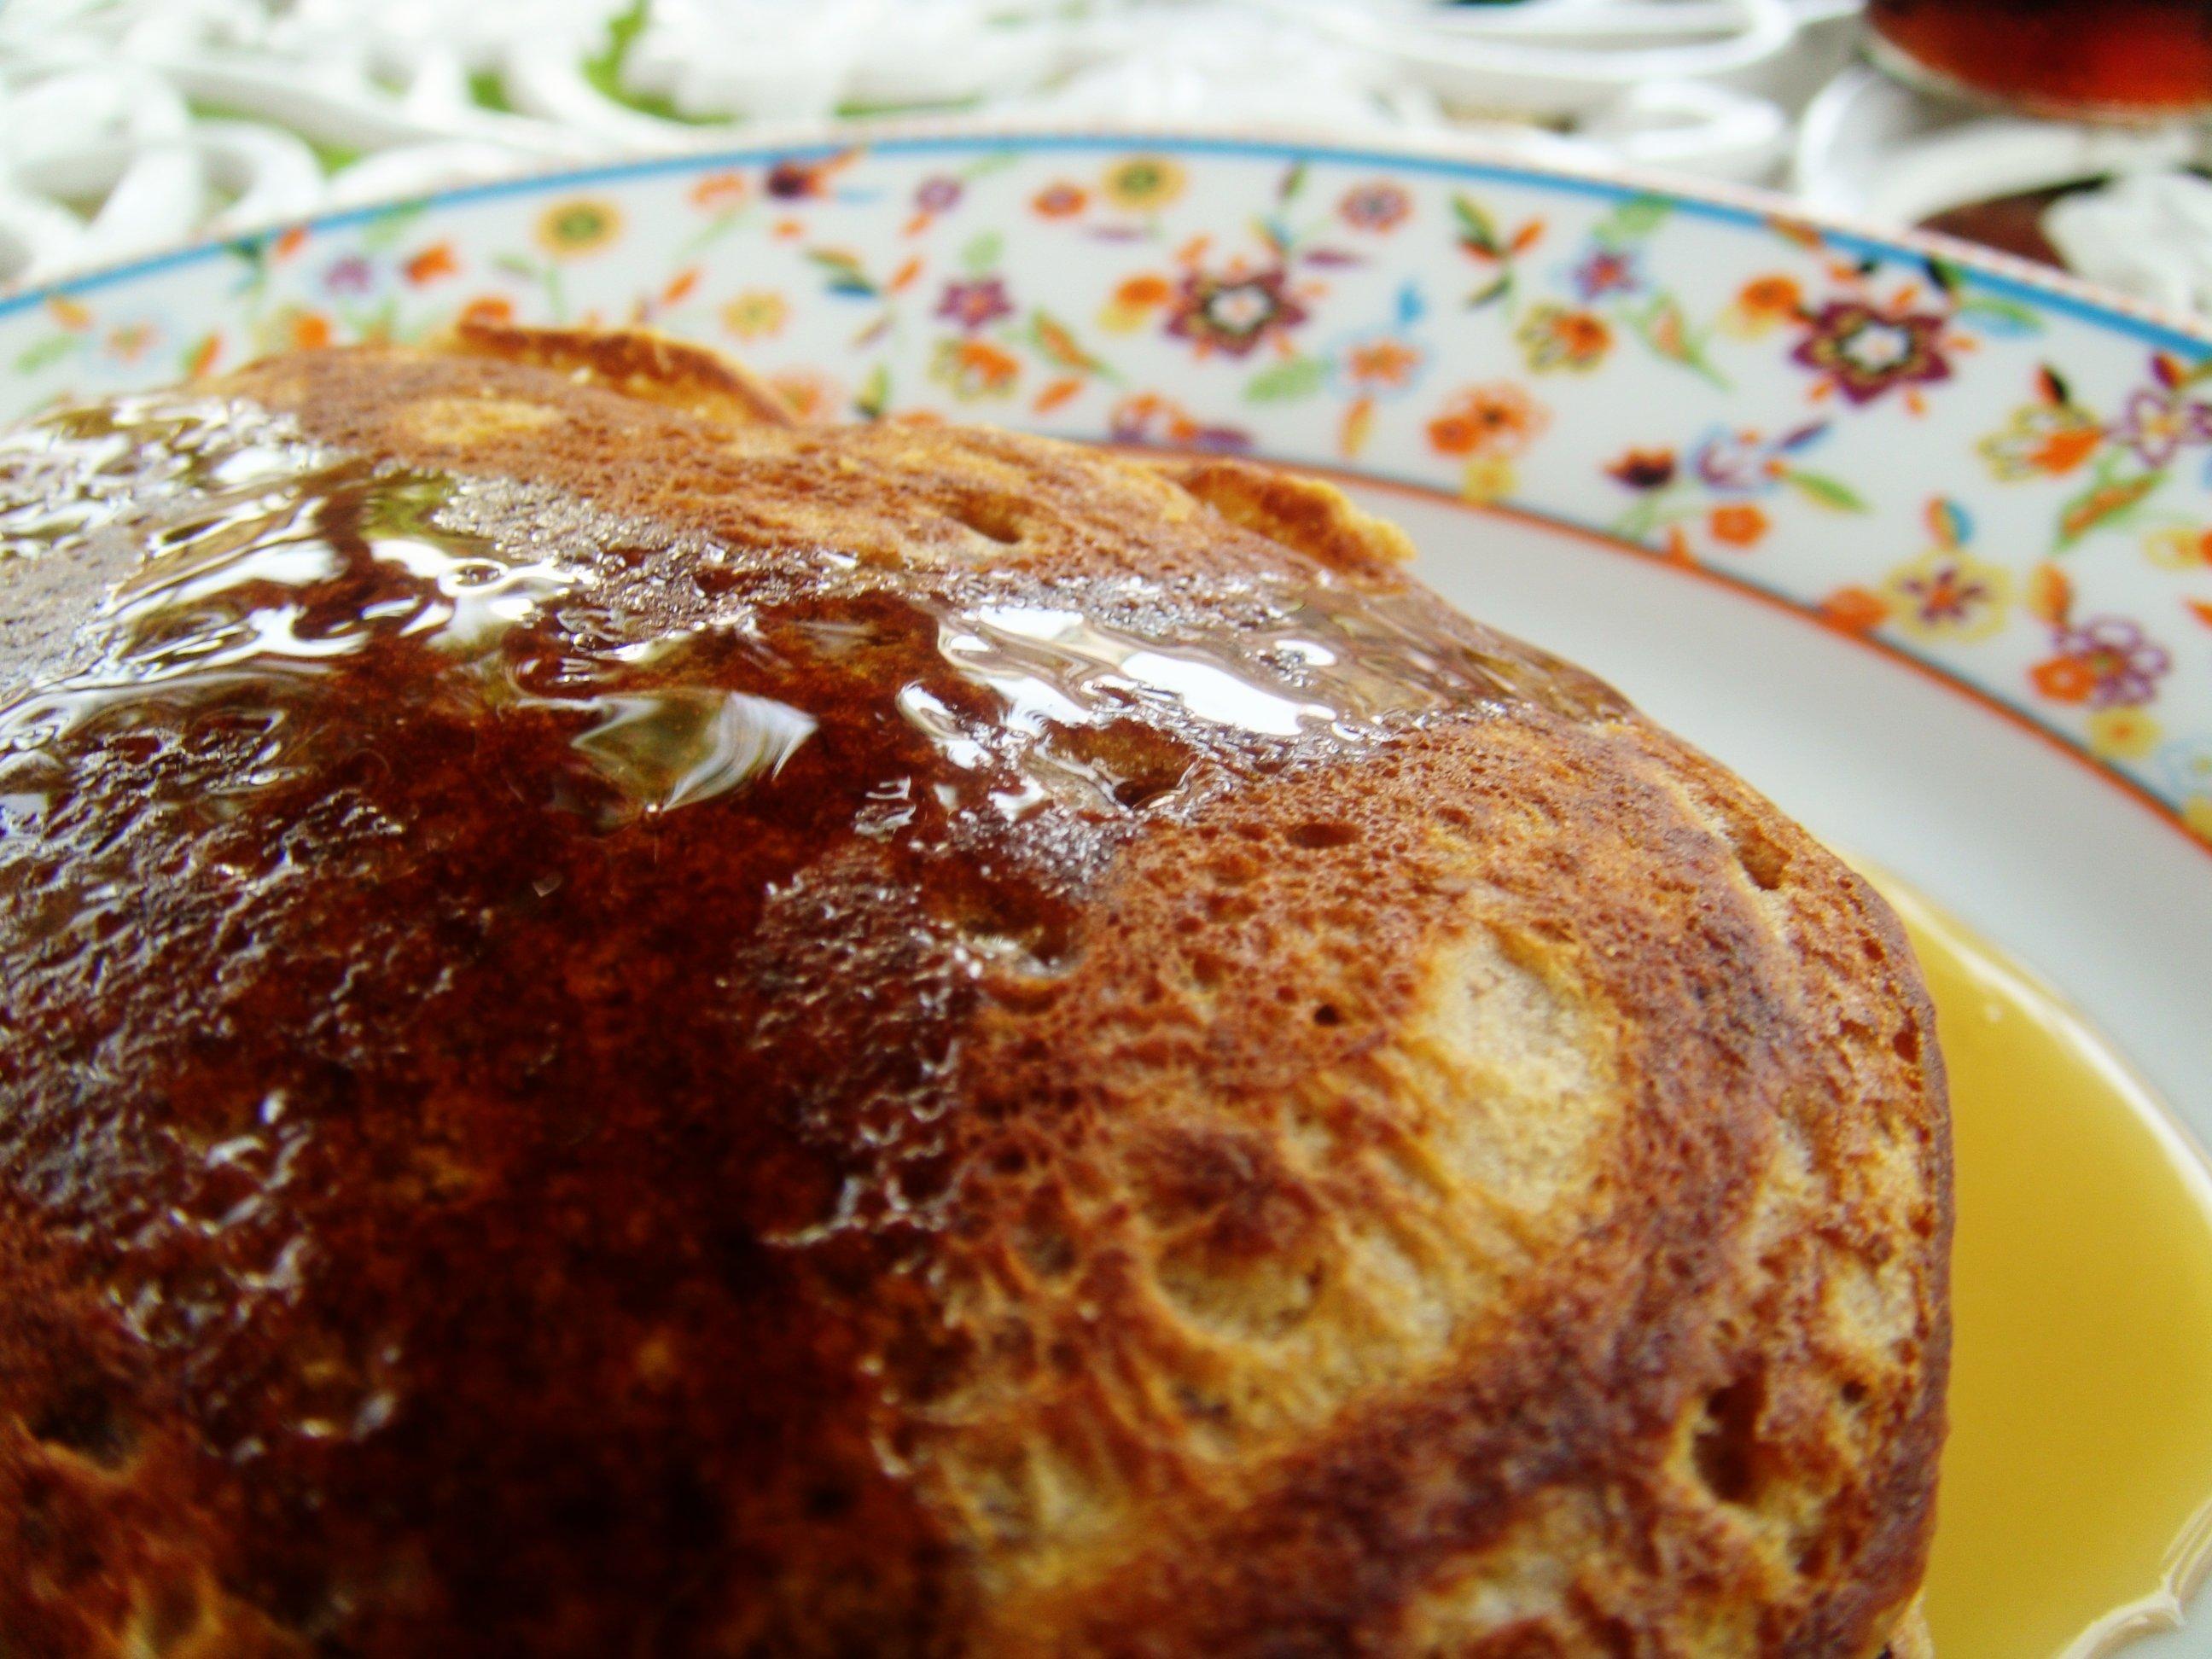 Copycat IHOP Harvest Grain & Nut Pancakes Recipe